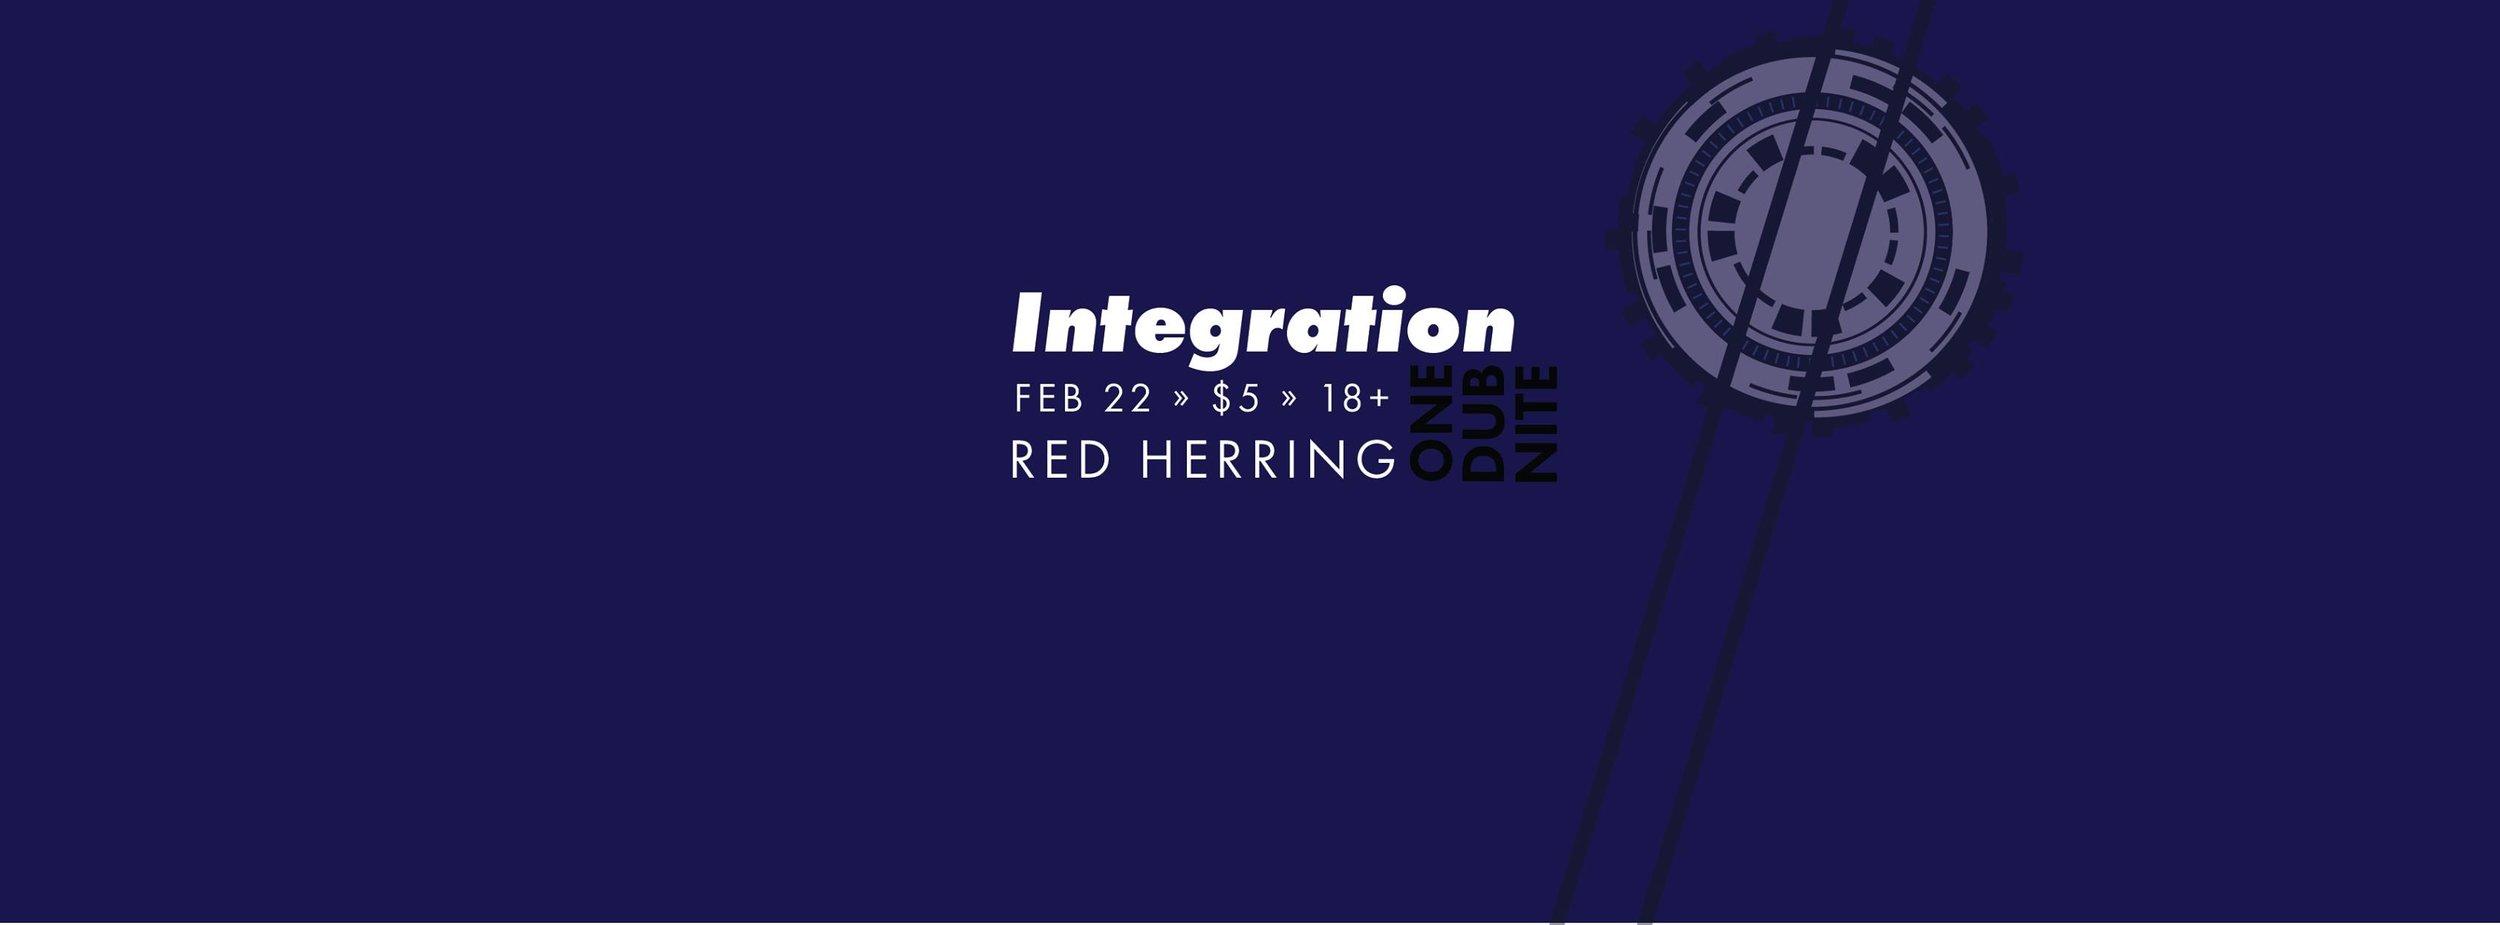 One Dub Nite | Integration - Duluth, MN